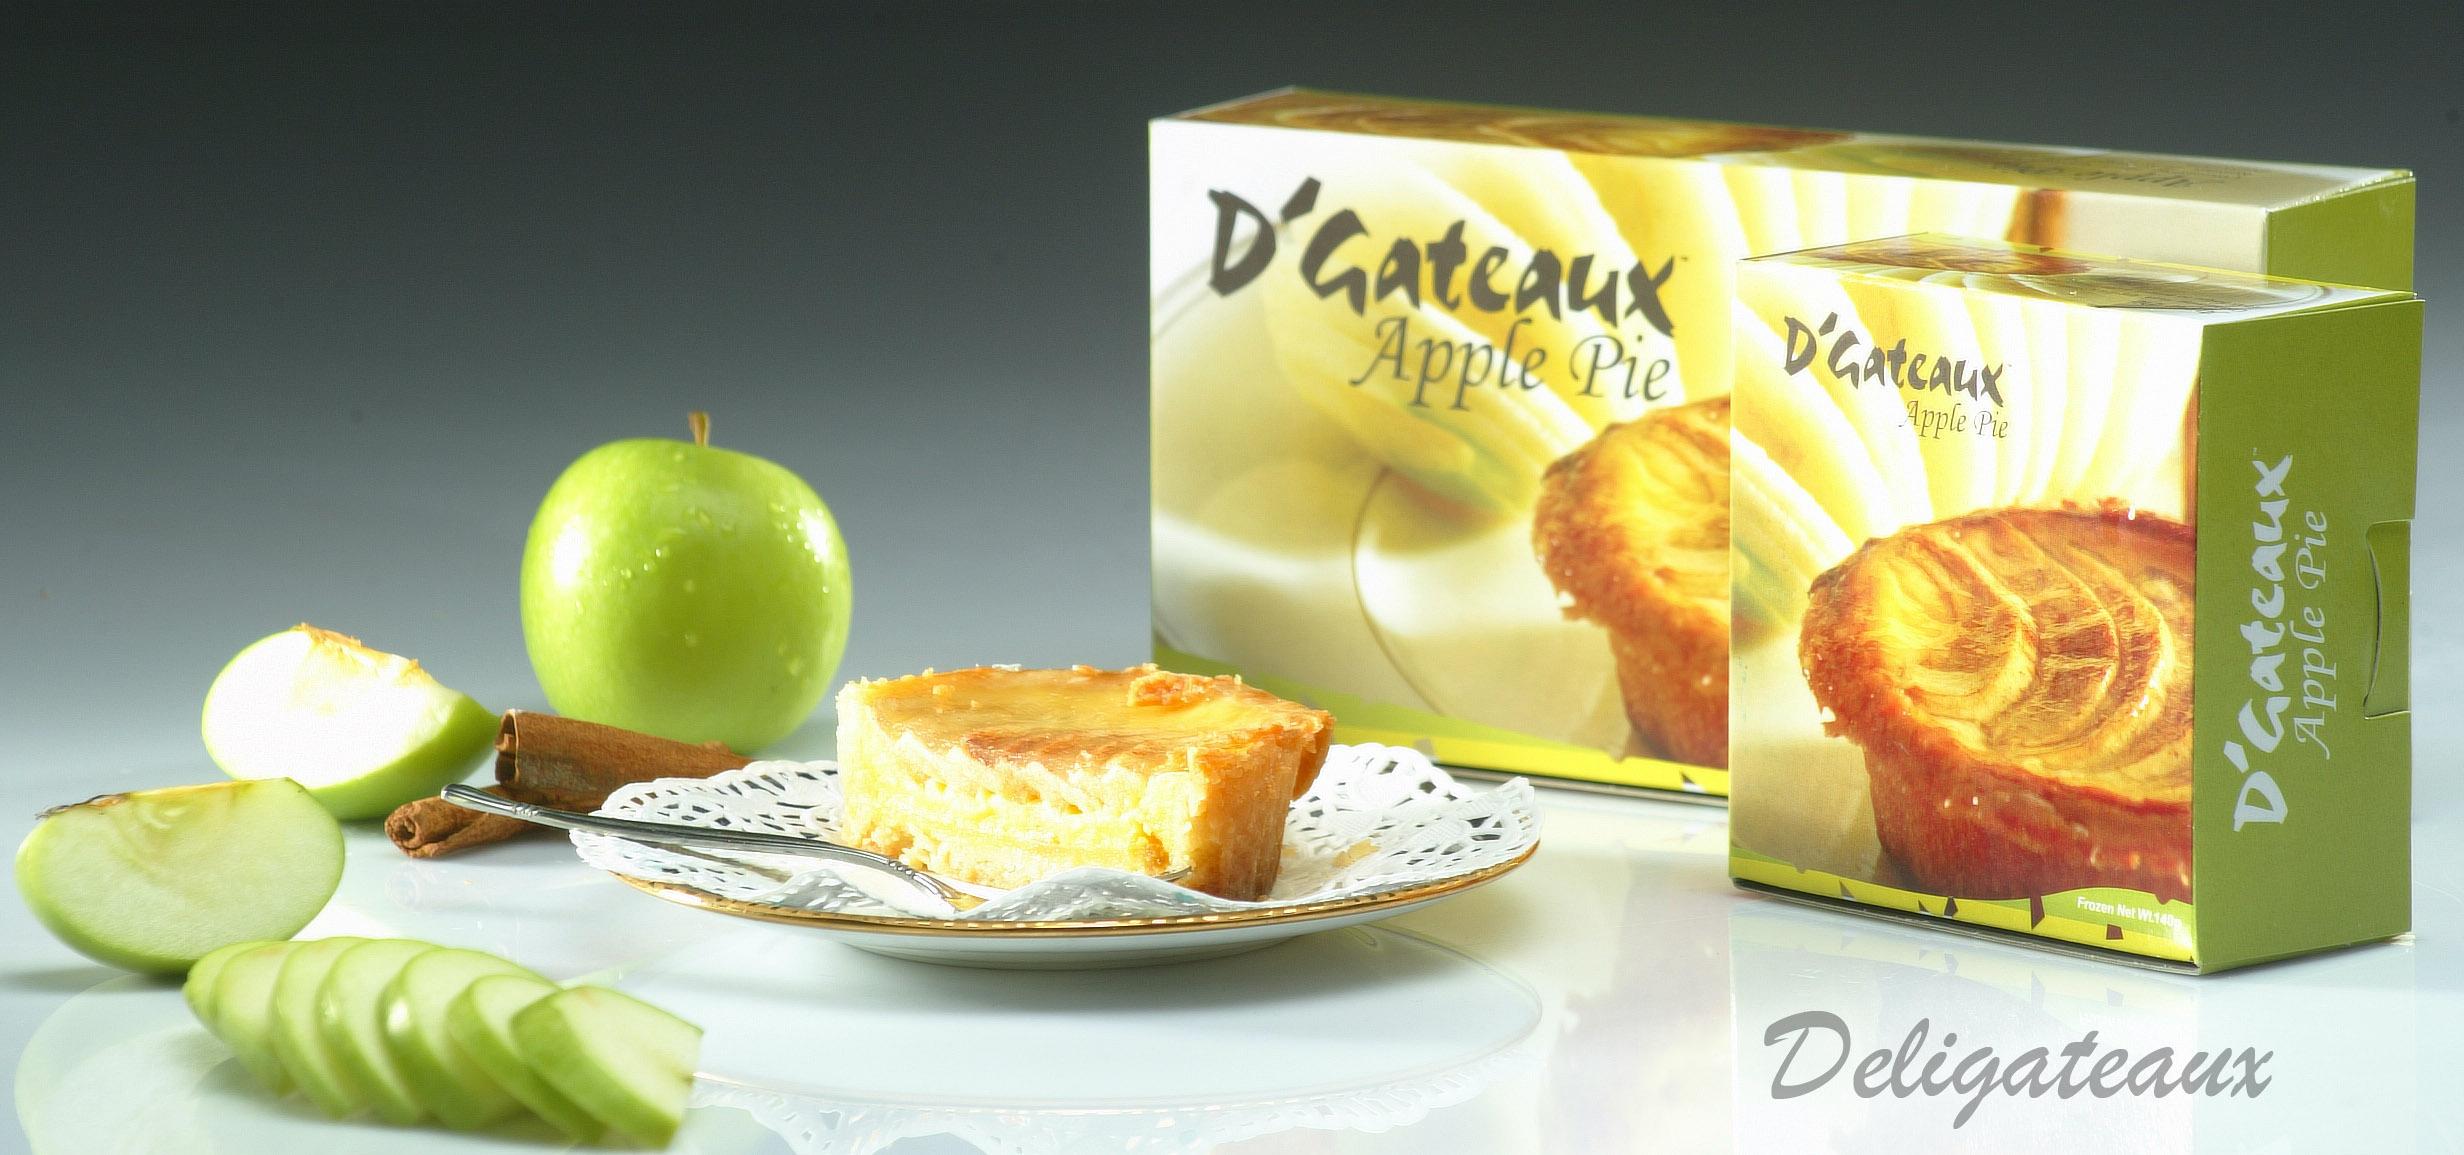 Deligateaux, Ain Dzaya, Hanis Zalikha, Cik Epal, Yuyu Zulaikha, Dessrt, Pastries, Confectionery, Brownies, Pies, Tart, Cakes